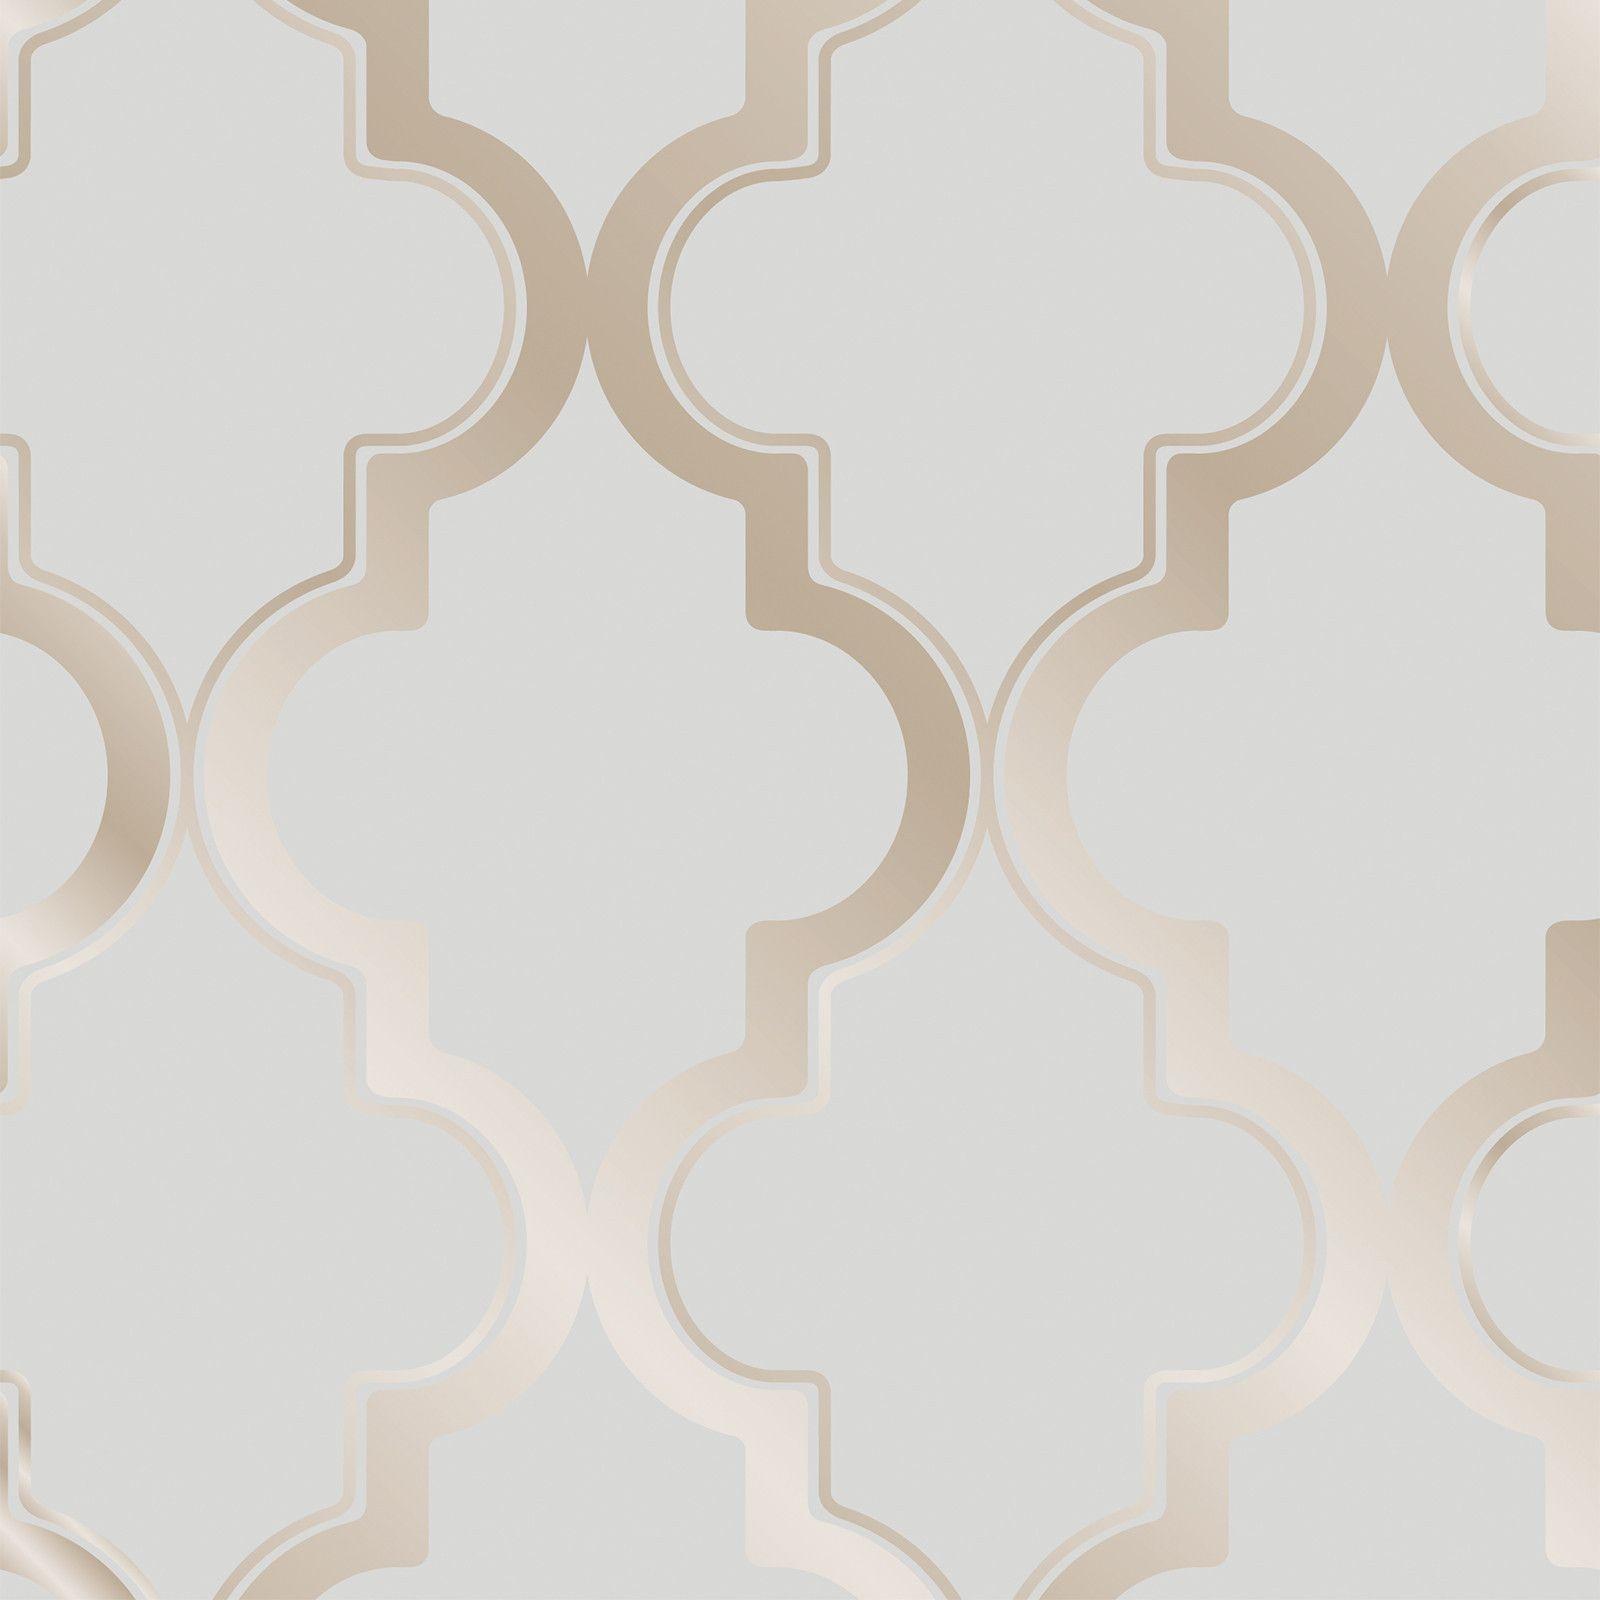 Marrakesh Self Adhesive Wallpaper in Bronze Grey design by